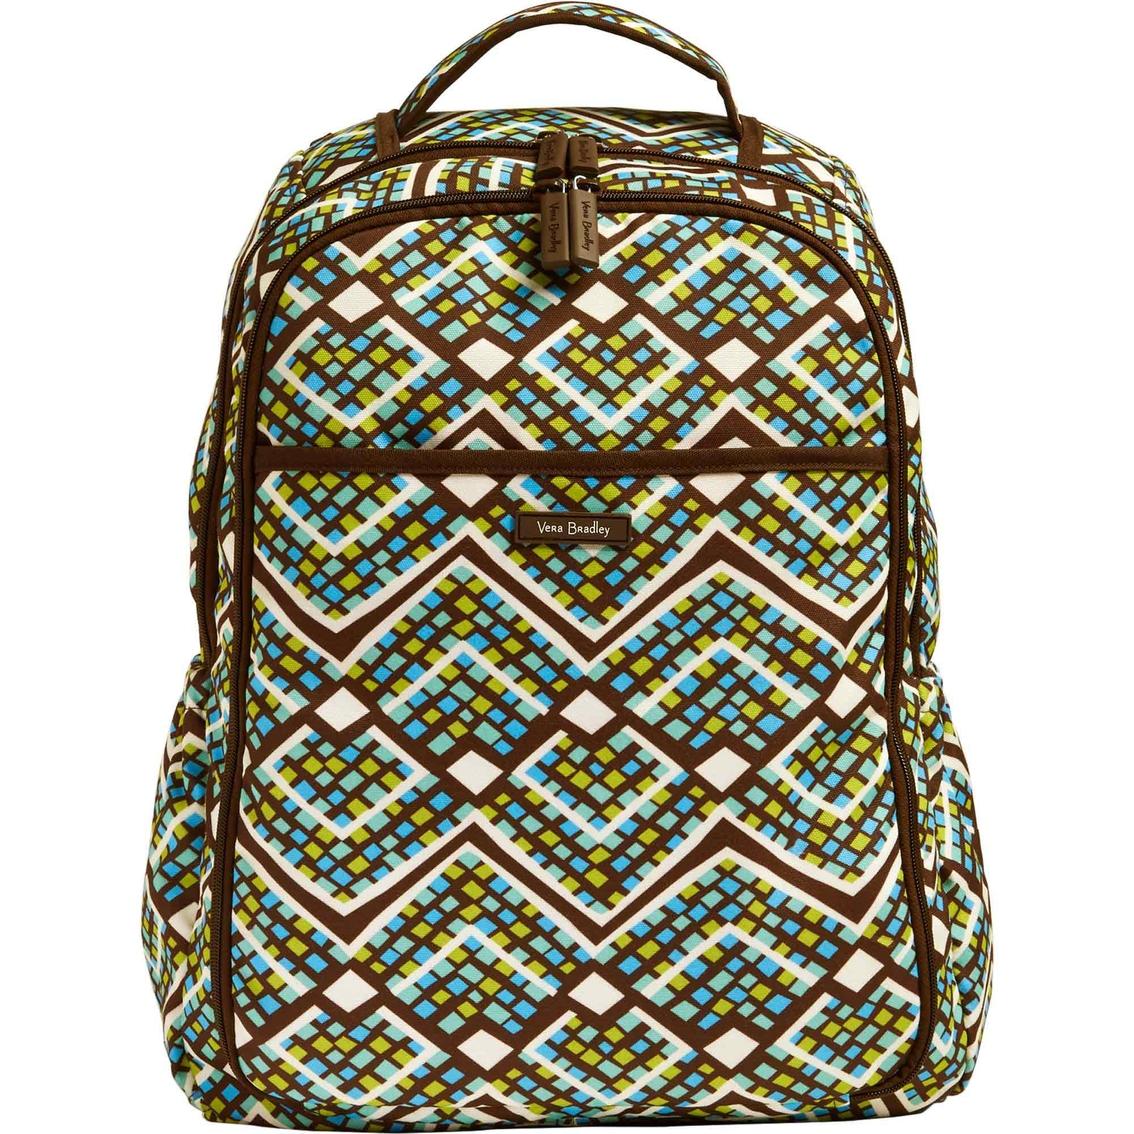 Vera Bradley Backpack Baby Bag Rain Forest